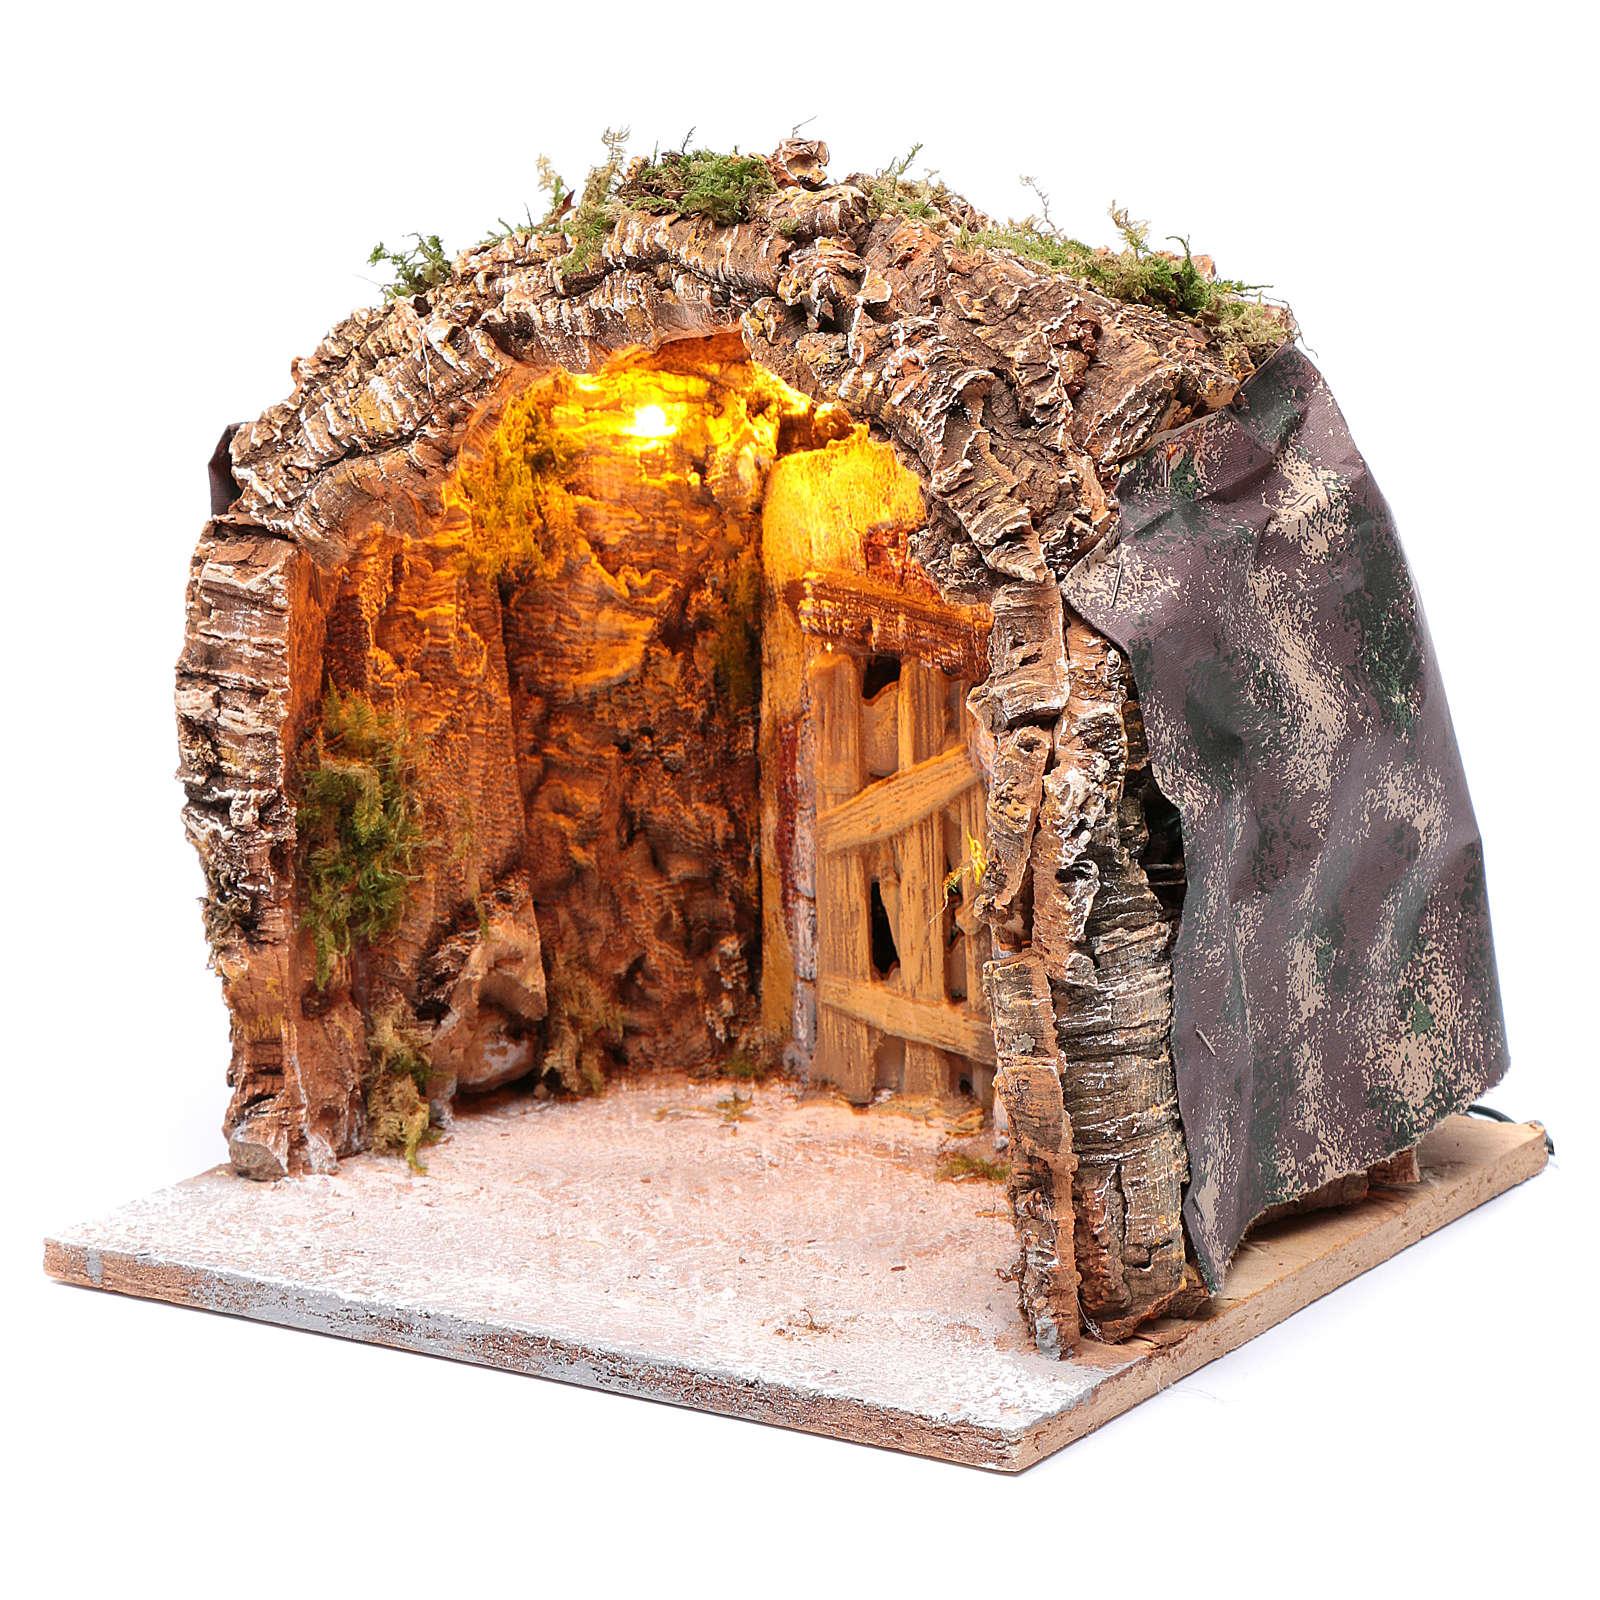 Illuminated grotto in wood and cork, nativity scene 28x25x26cm 4